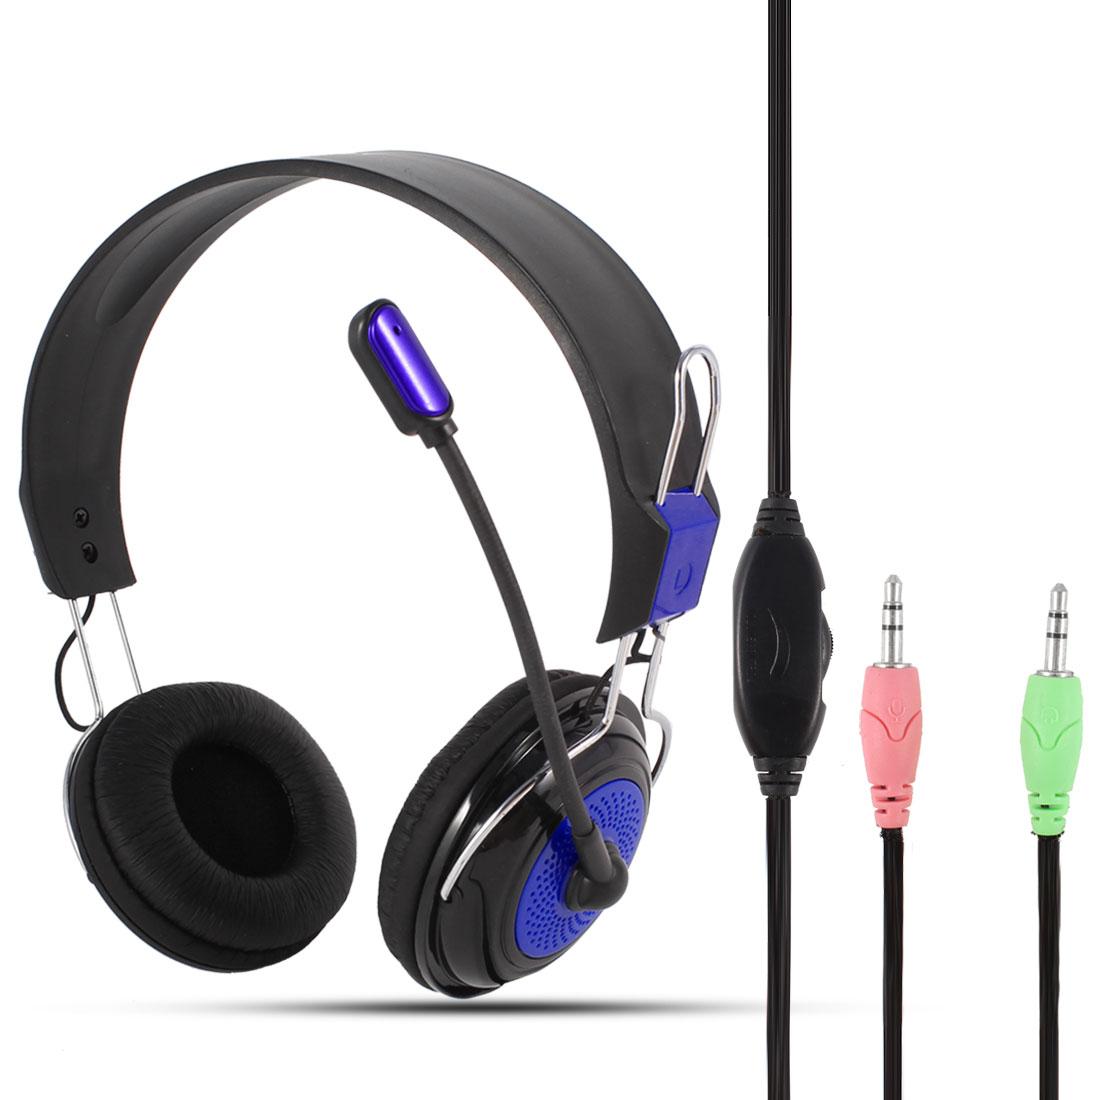 PC Computer Adjustable Headband 3.5mm Connector Headphone Black Purple w Microphone